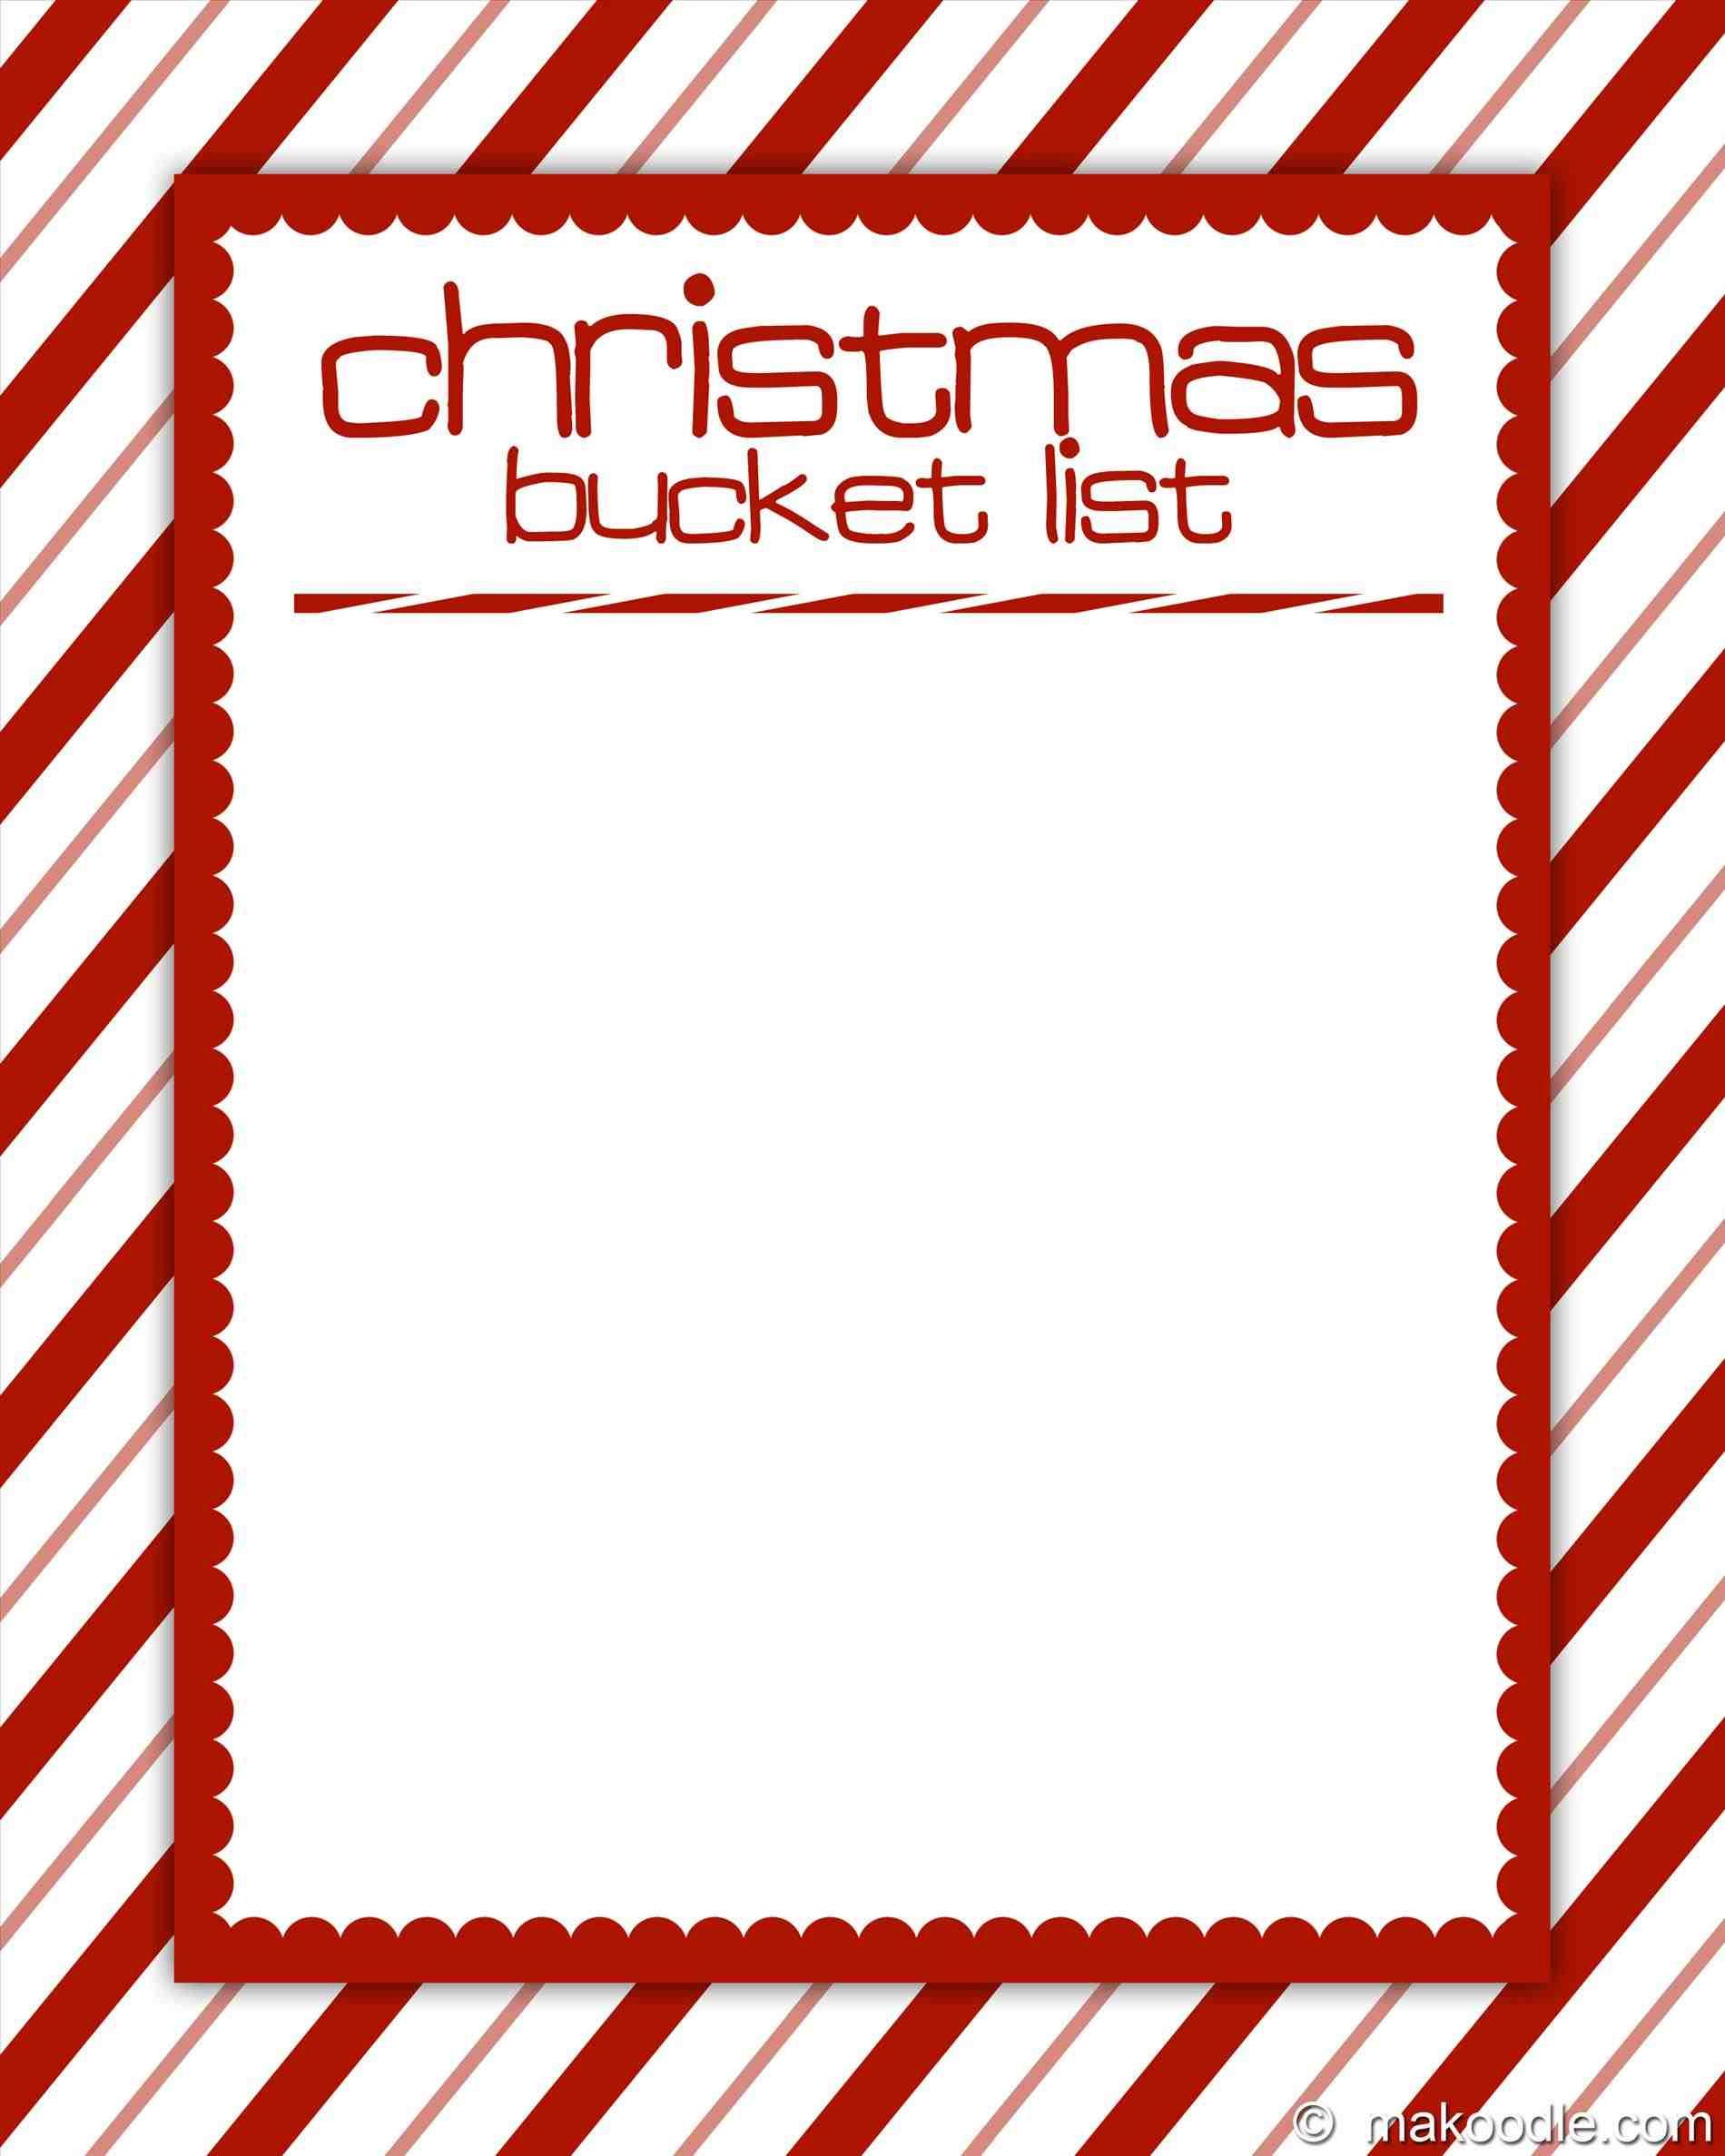 1900x2375 Christmas Chevron Border Cheminee.website